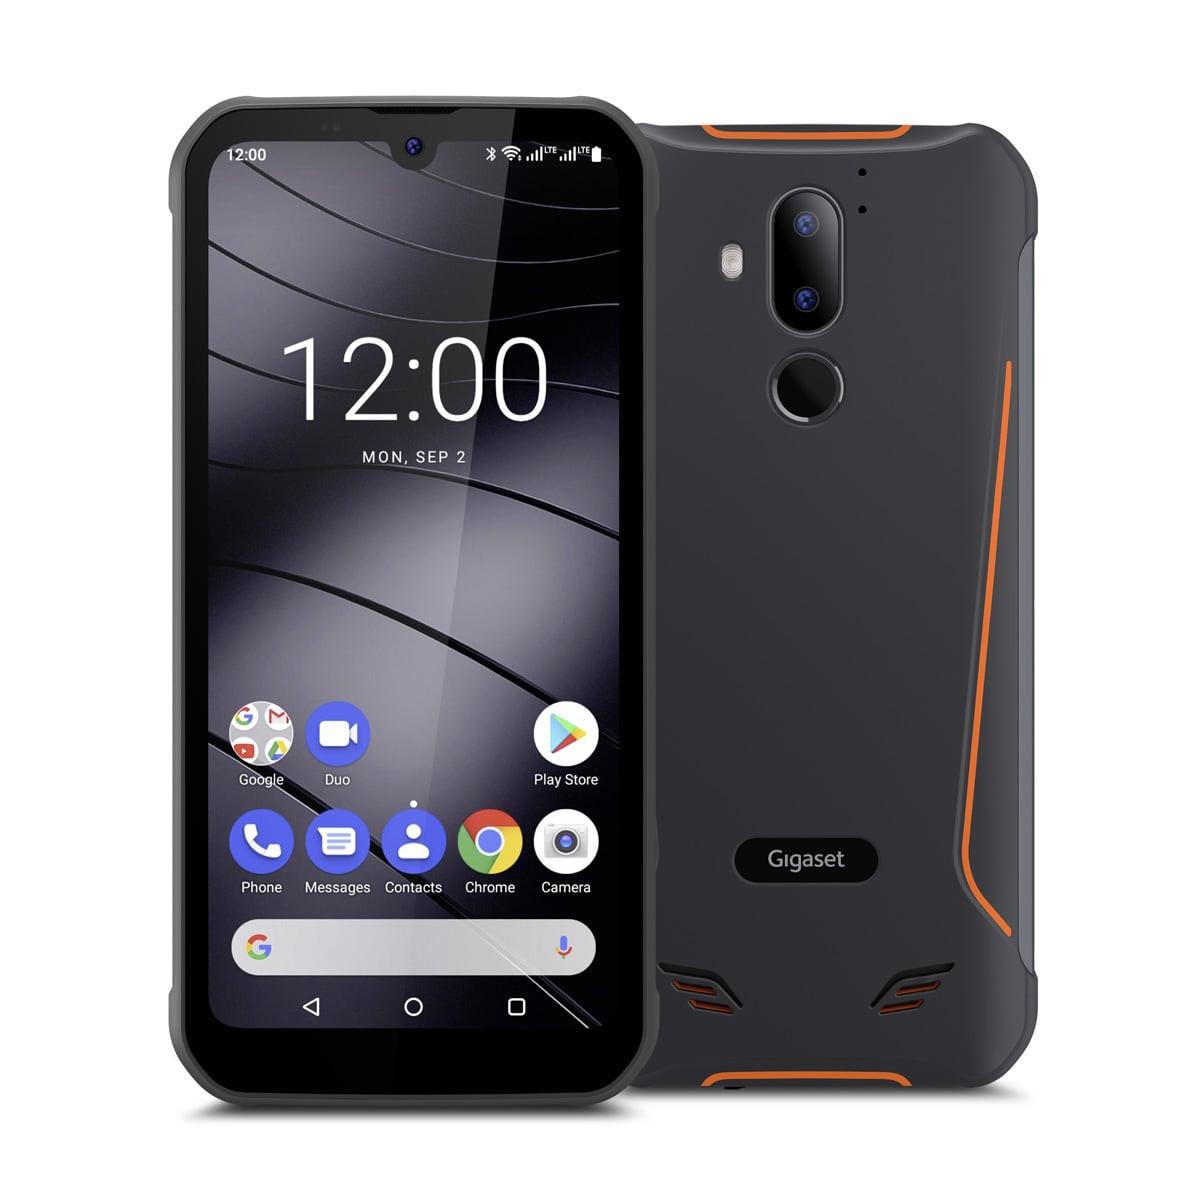 Gigaset GX290 smartphone 01